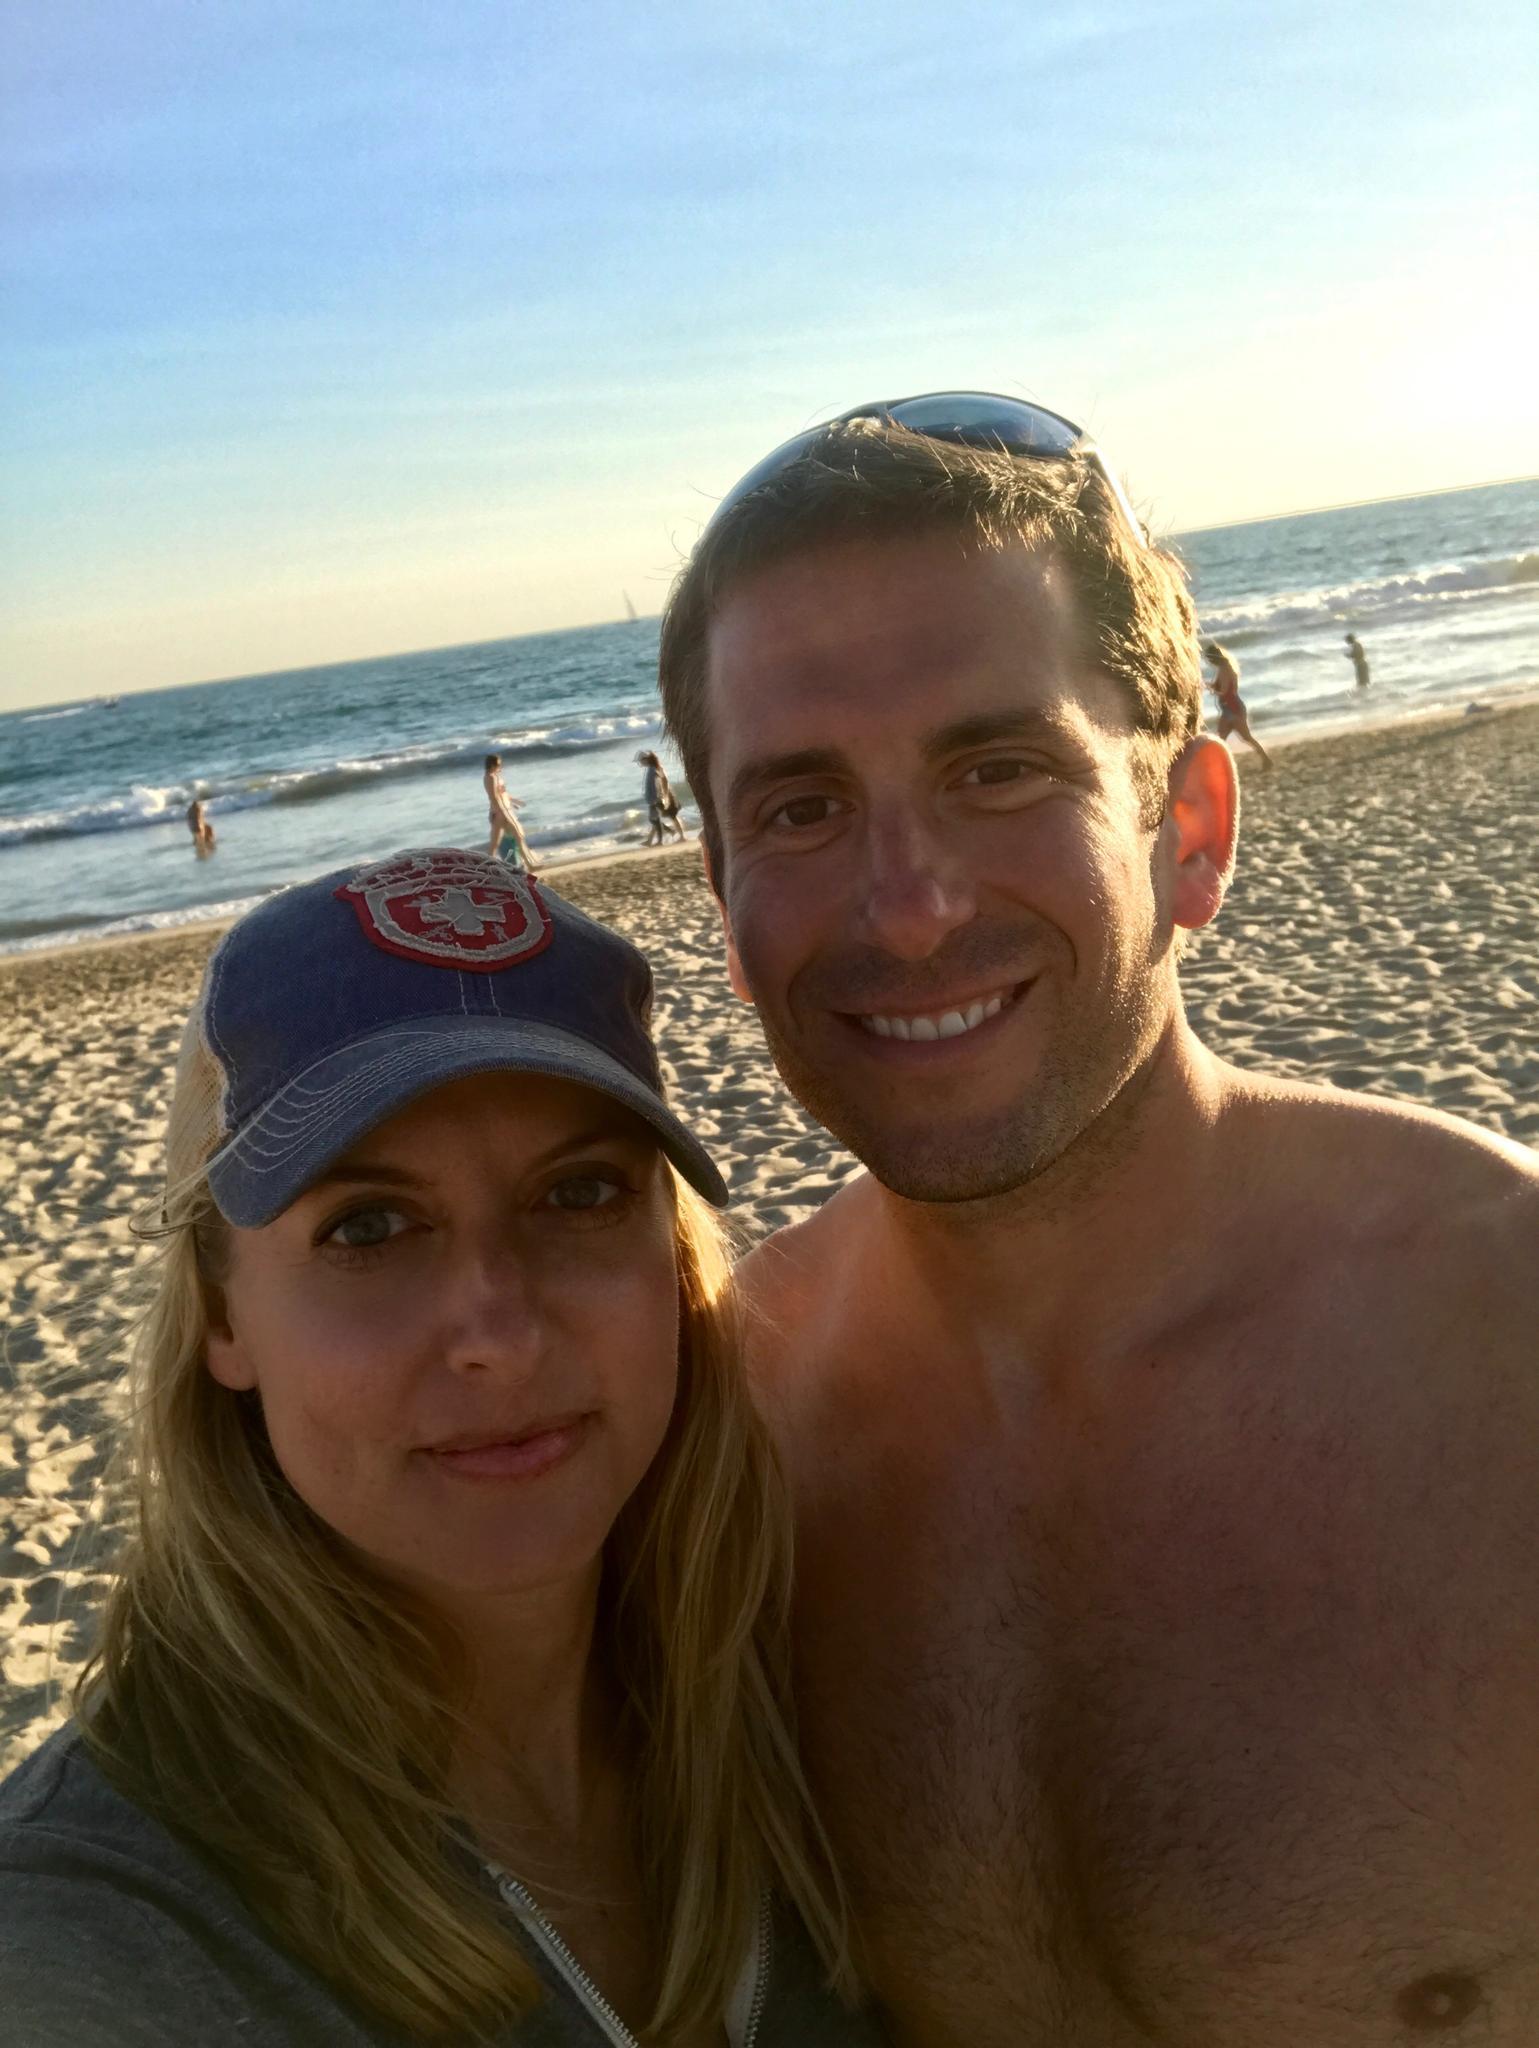 Venice Beach, July 4th, 2018